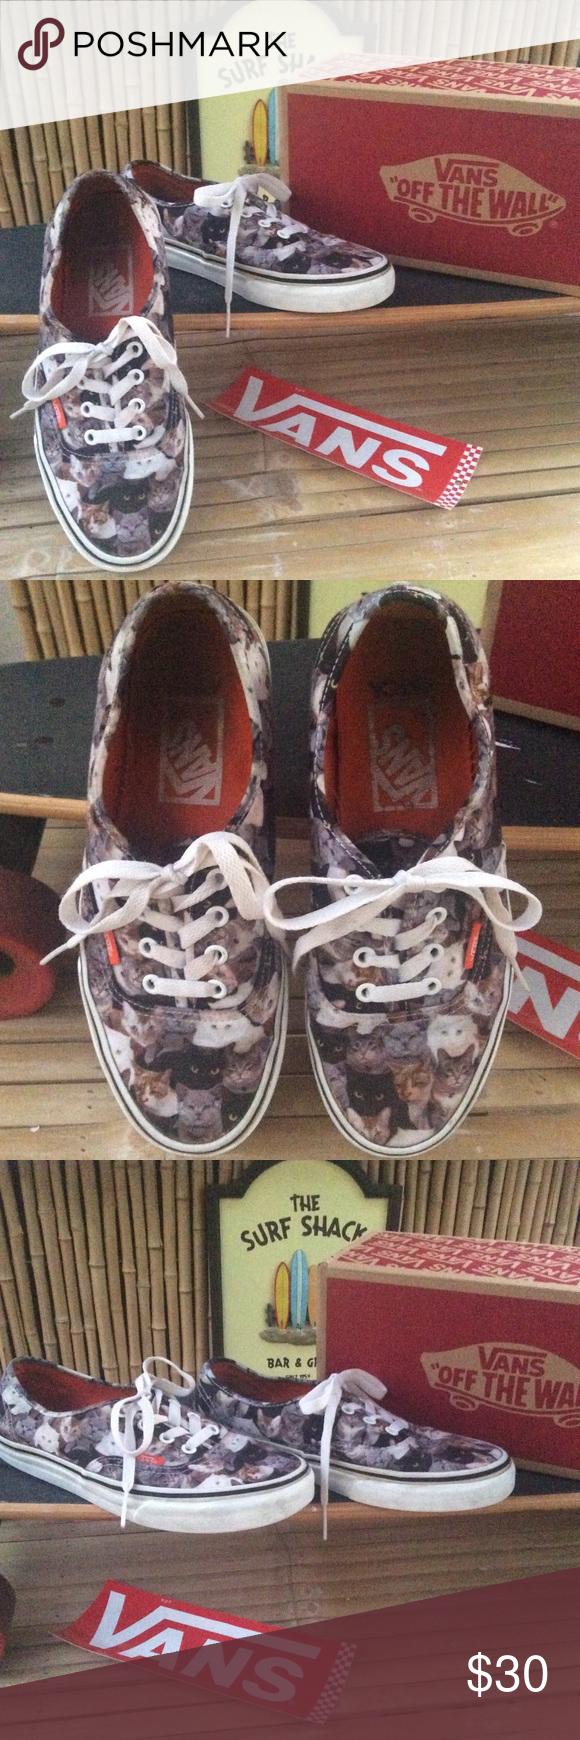 Vans Kitten Kitty Cat Low Top Sneakers Size 7 5 Top Sneakers Vans Sneakers